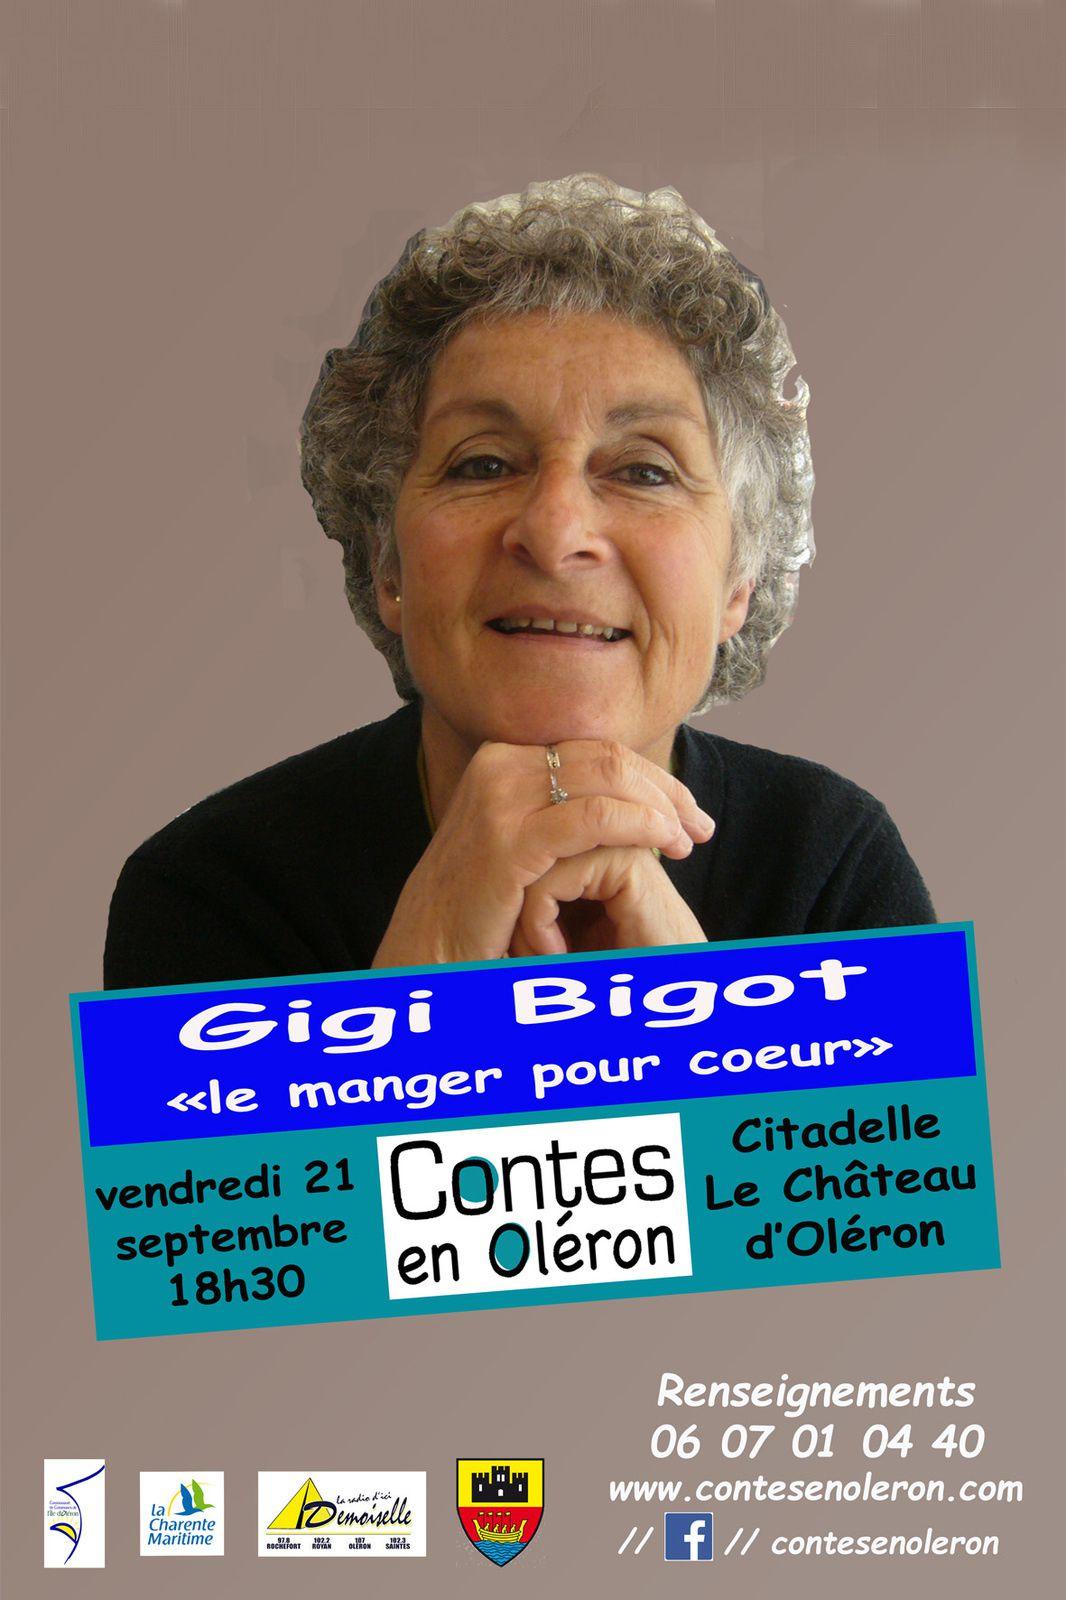 Gigi Bigot